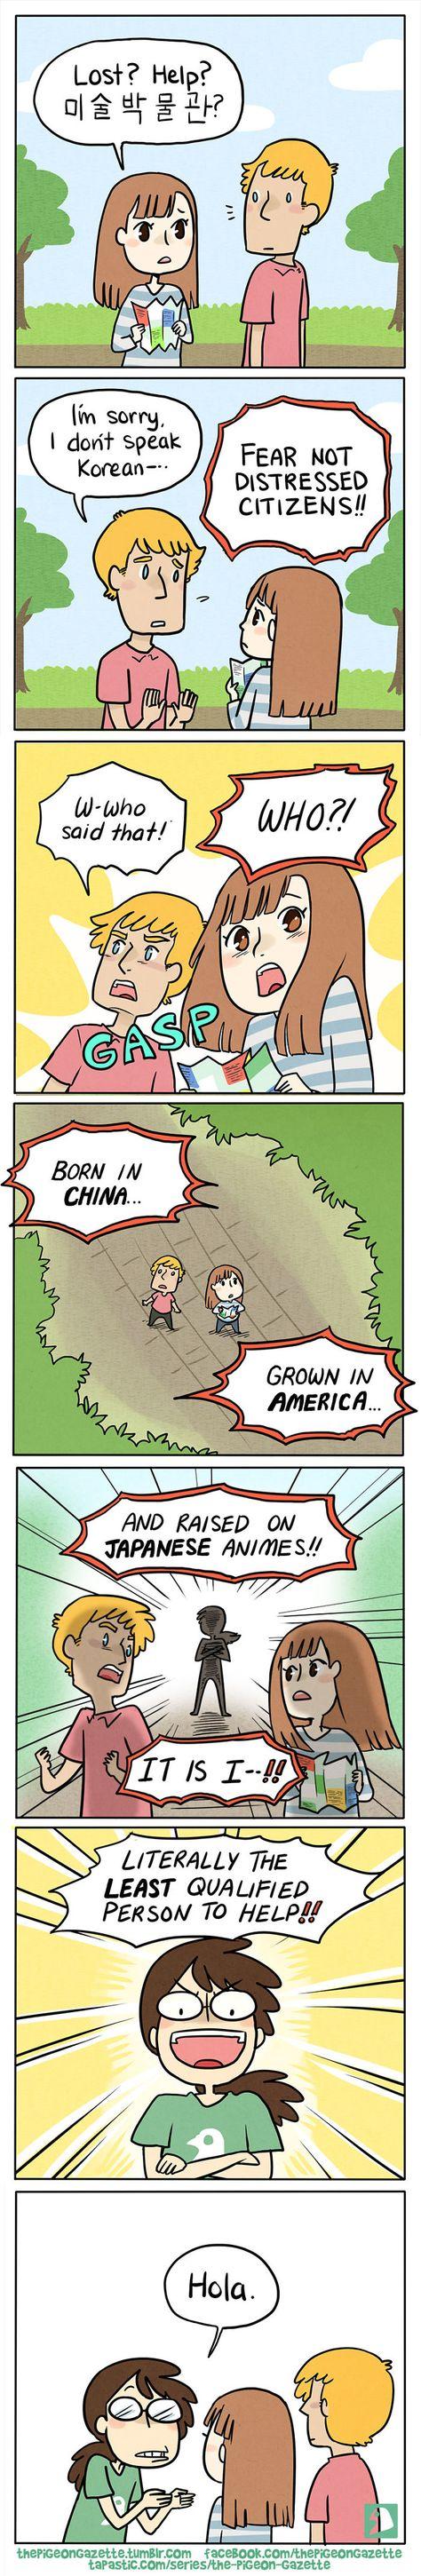 122 Hilarious Comics For Socially Awkward People